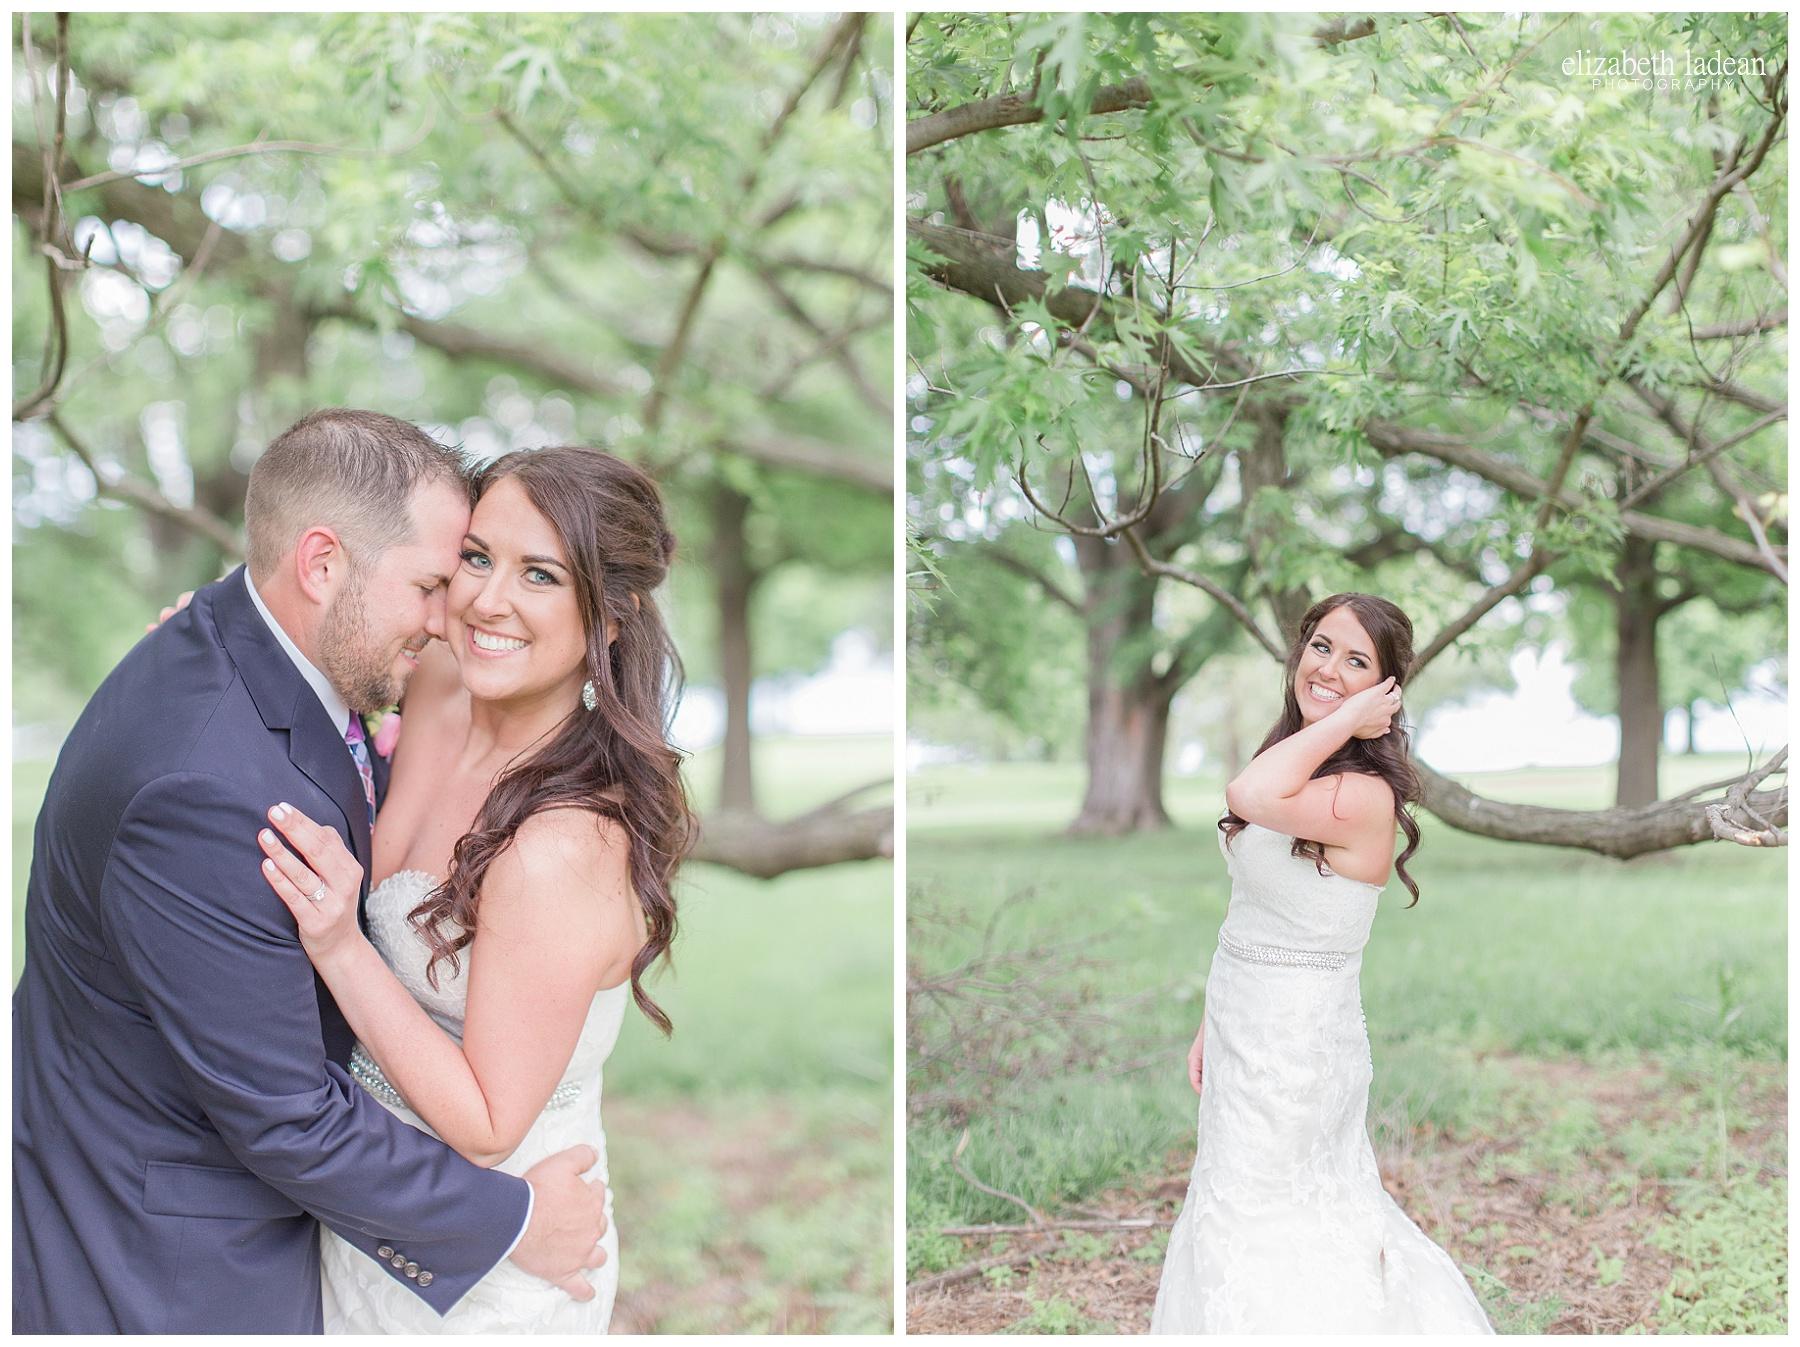 Hillcrest-Country-Club-Kansas-City-Wedding-Photography-E+J-0520-Elizabeth-Ladean-Photography-photo_0869.jpg